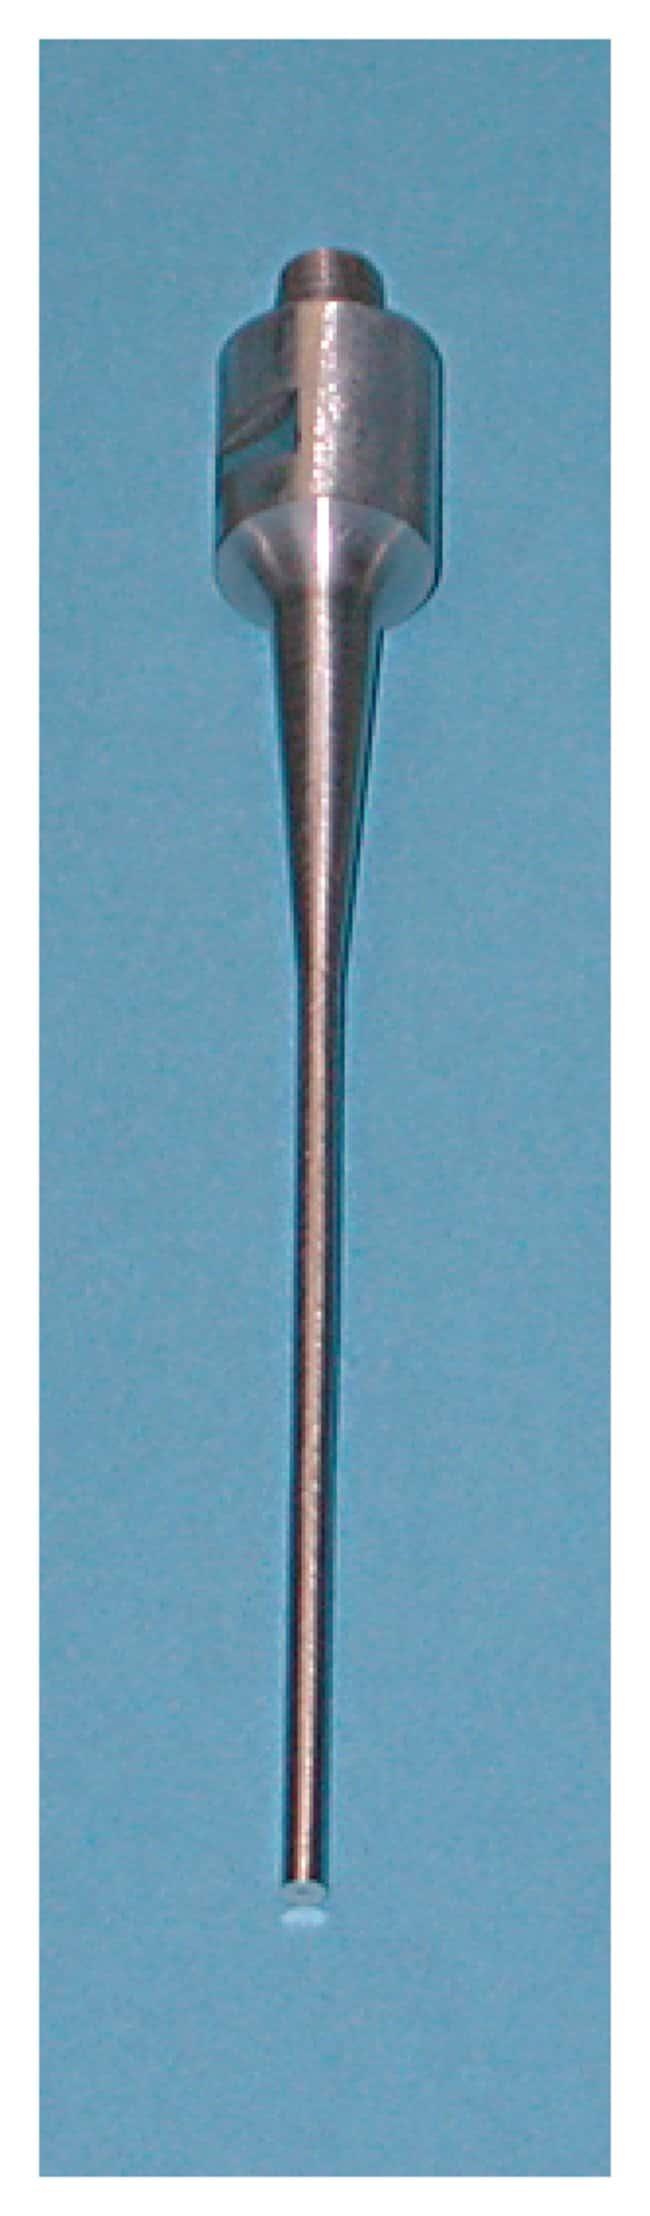 Branson UltrasonicsMicrotips for Sonifiers SLPe, SLPt, 150E and 150T:Sonicators:Ultrasonic